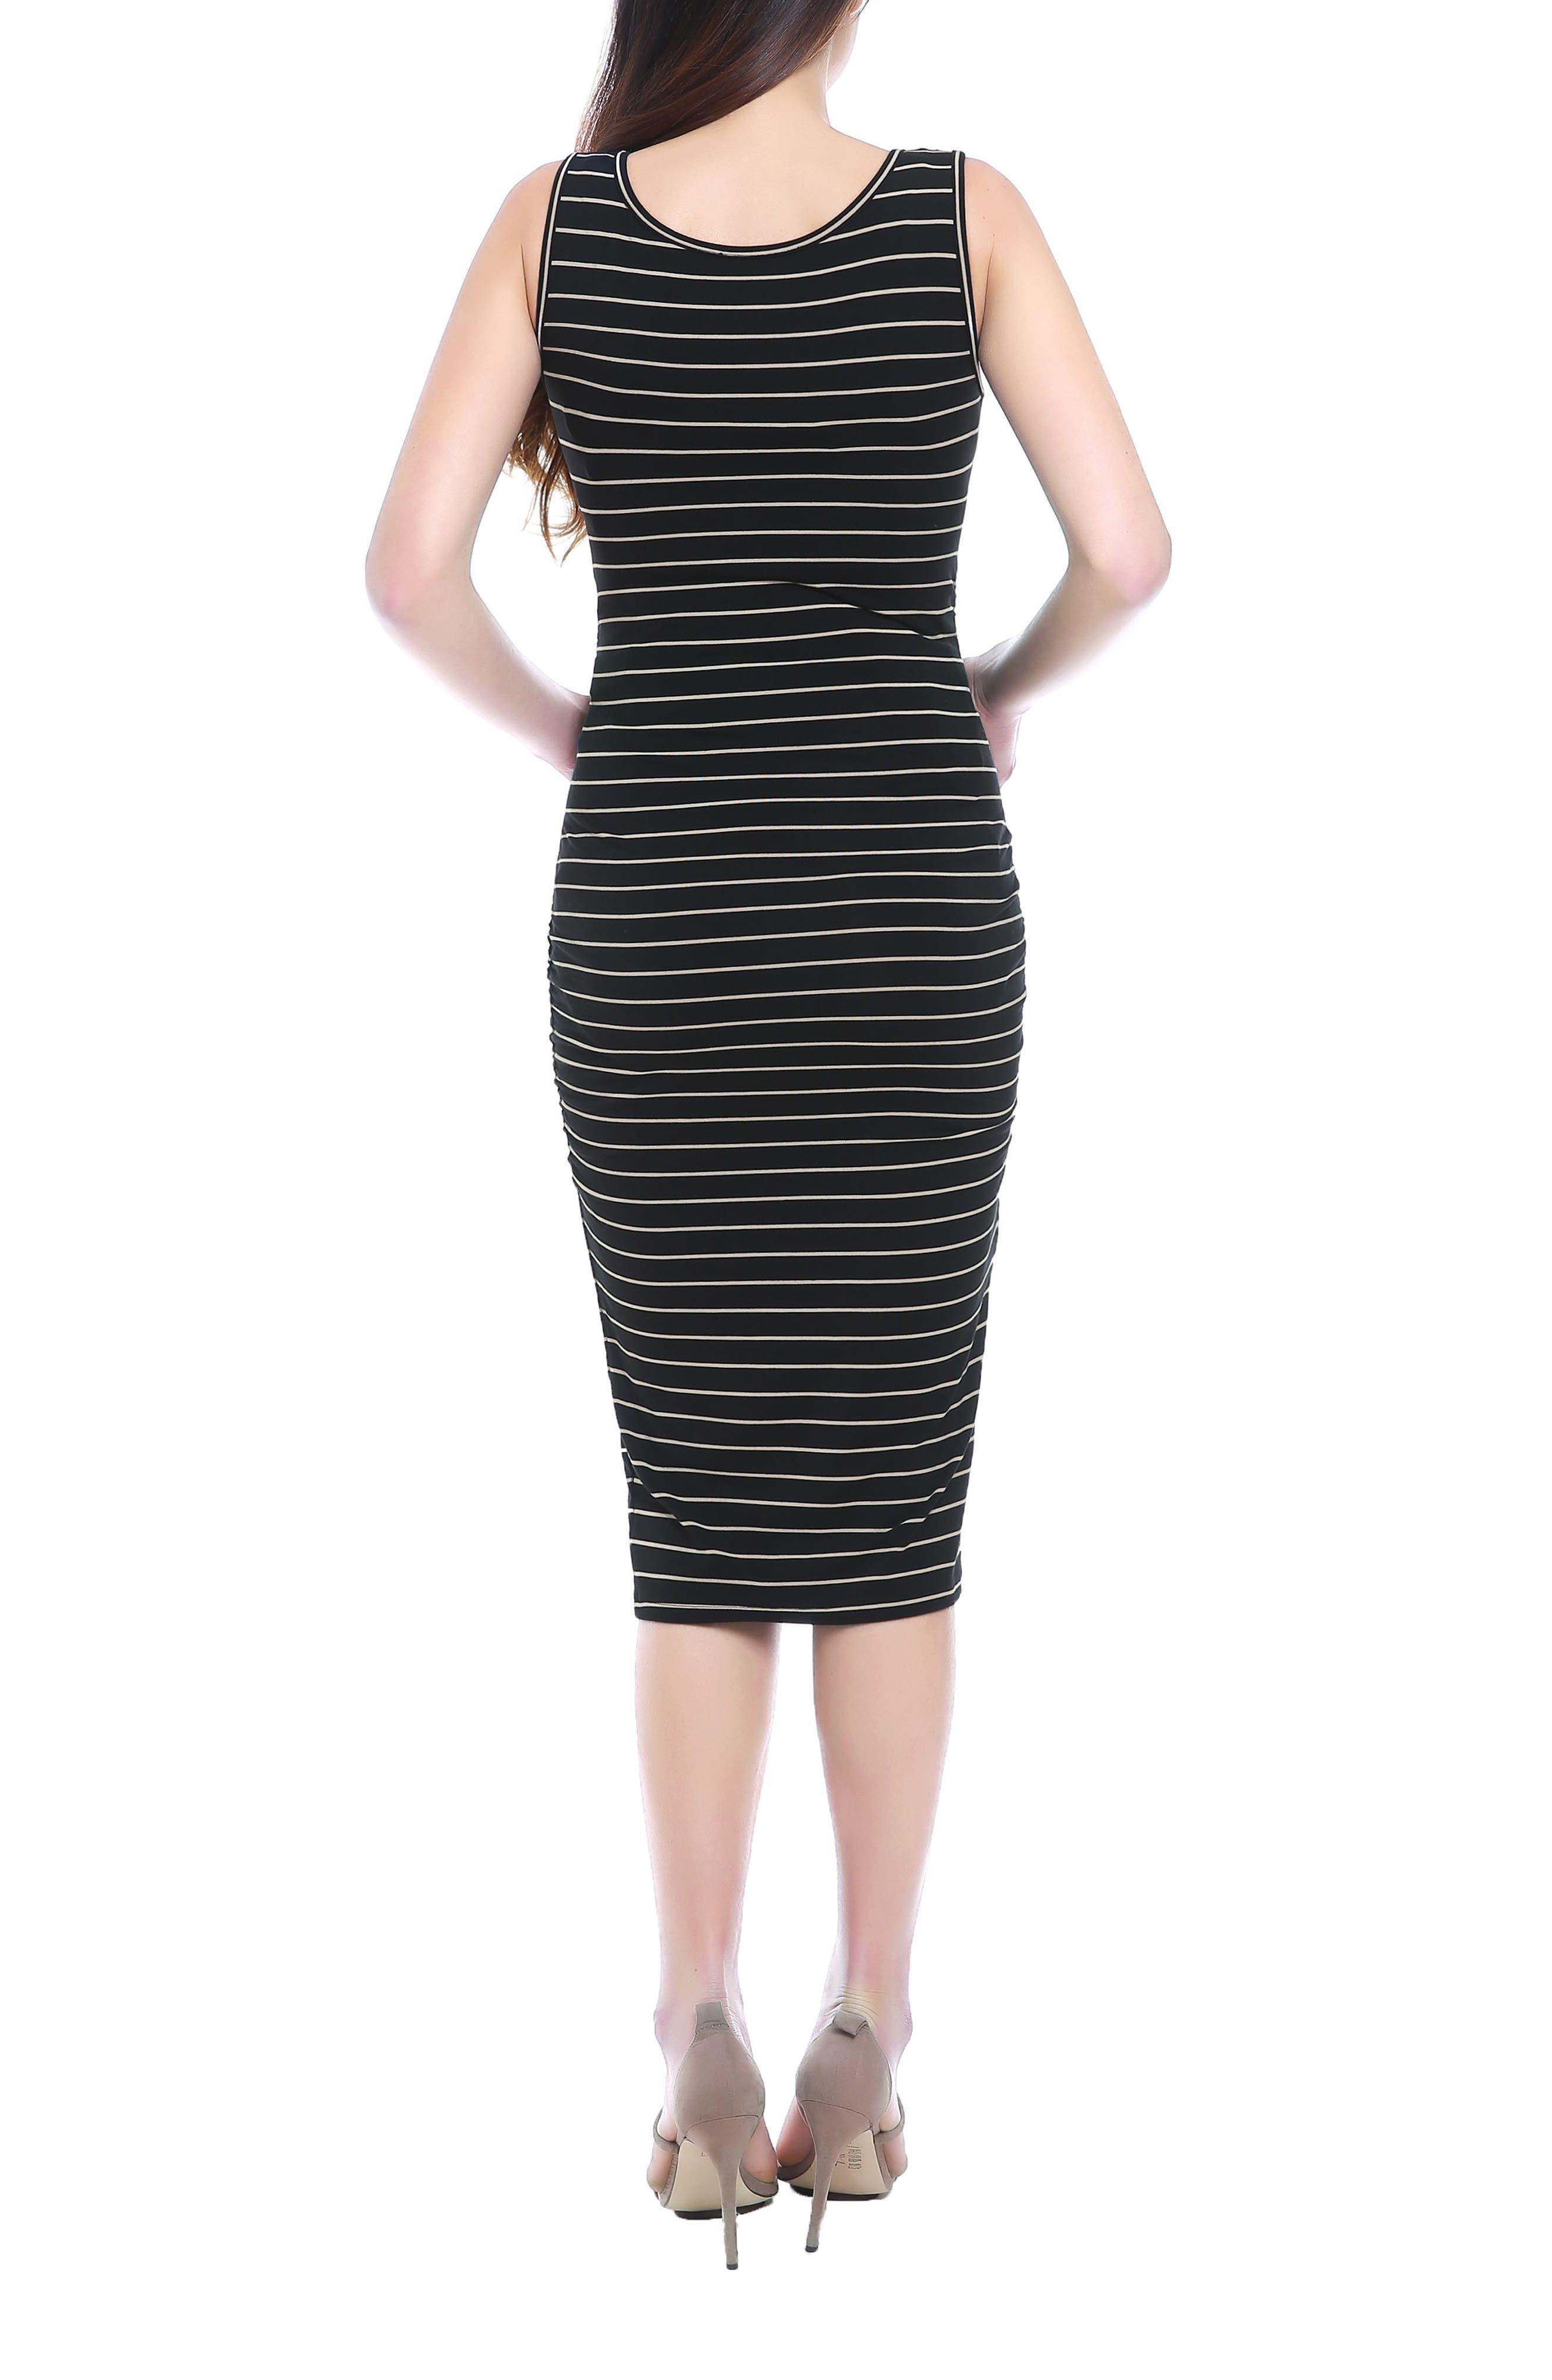 KIMI AND KAI, Tobi Stripe Maternity Dress, Alternate thumbnail 2, color, BLACK/ BEIGE